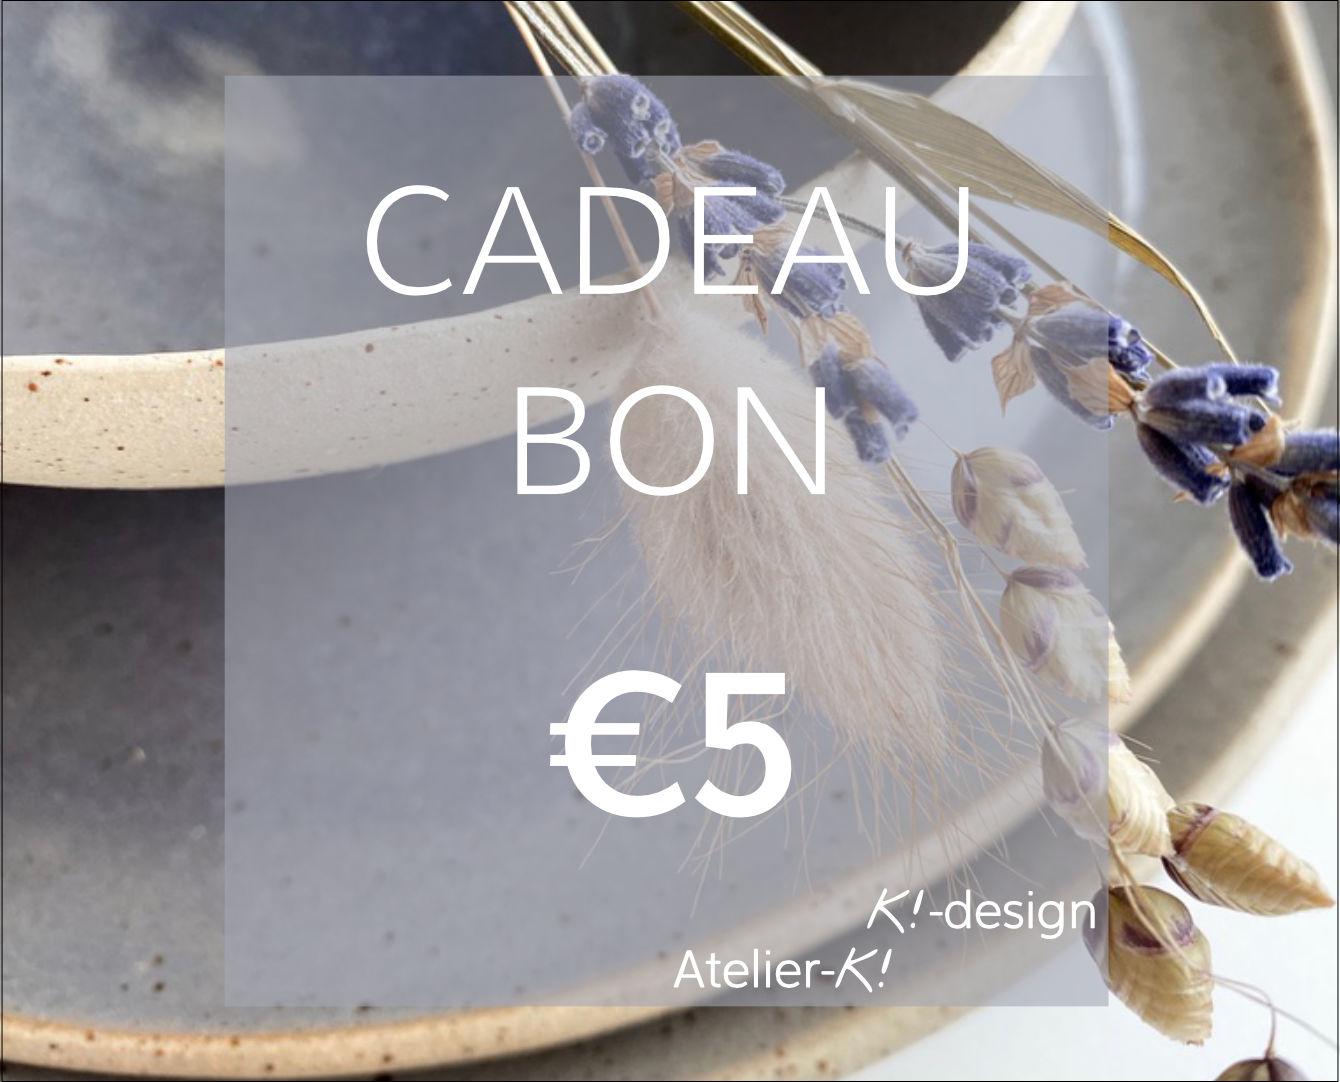 Image Cadeaubon €5